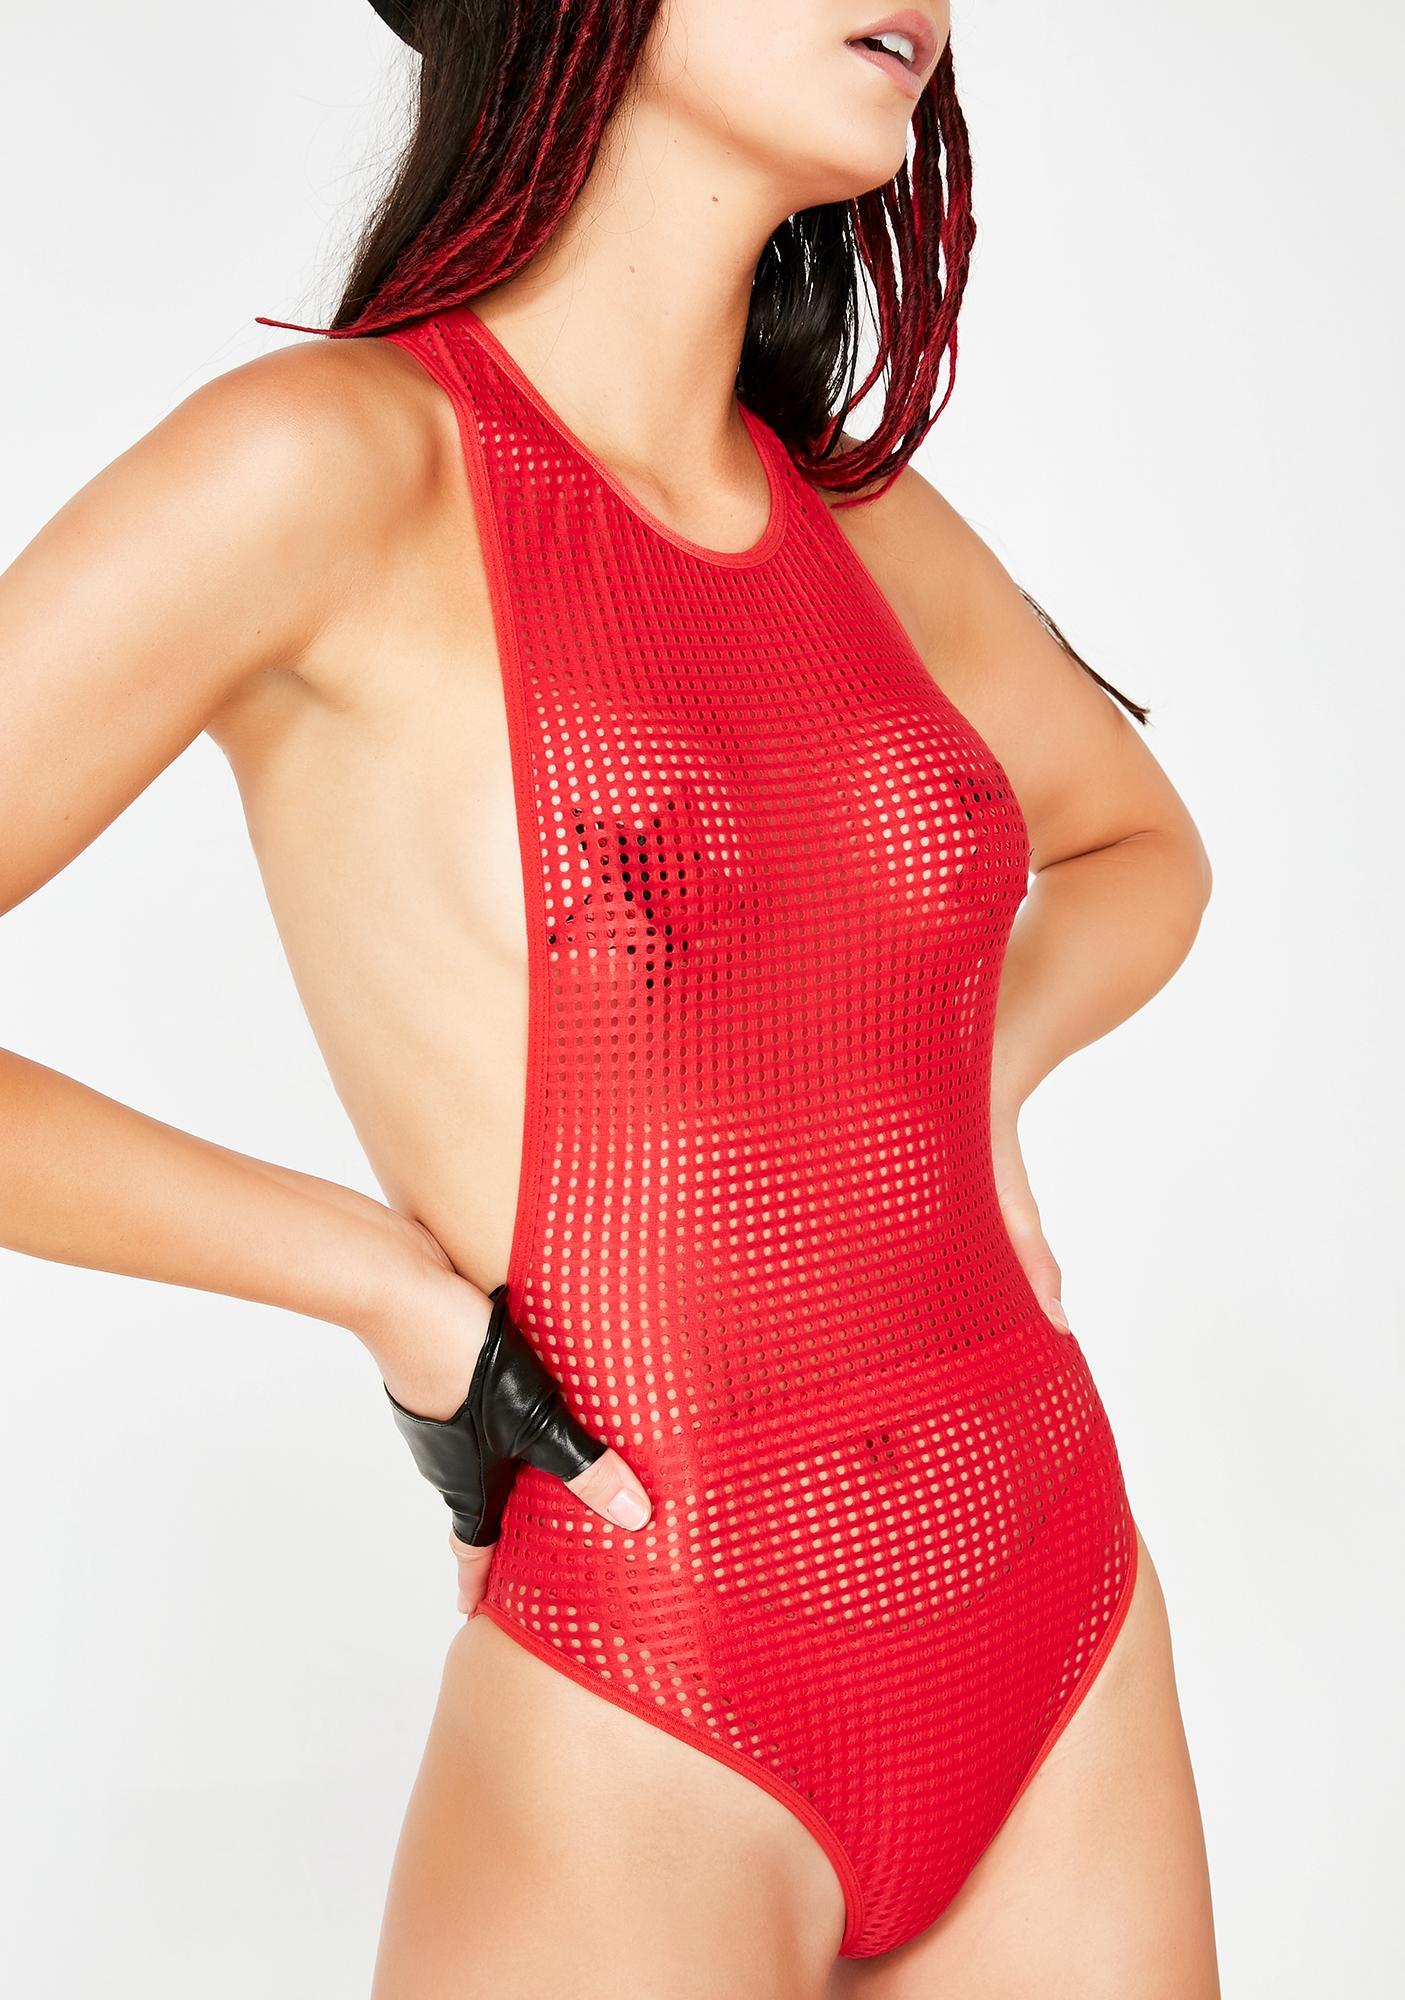 Club Exx Feisty Aphrodite Mesh Bodysuit